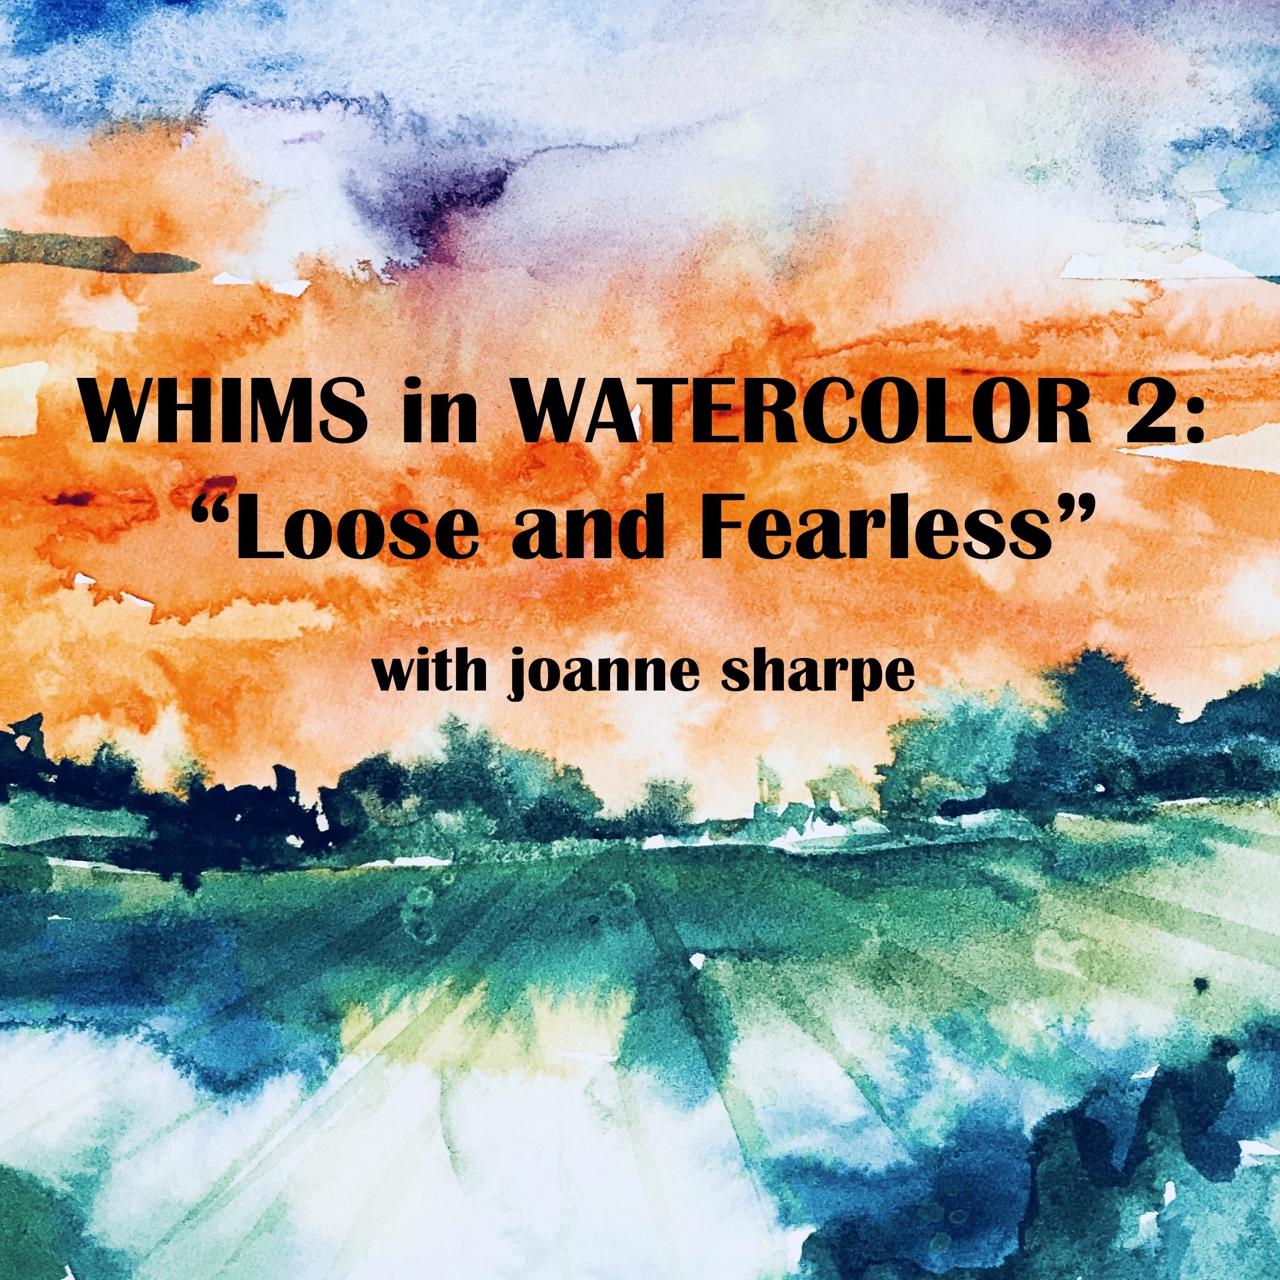 Joanne Sharpe — Joanne Sharpe